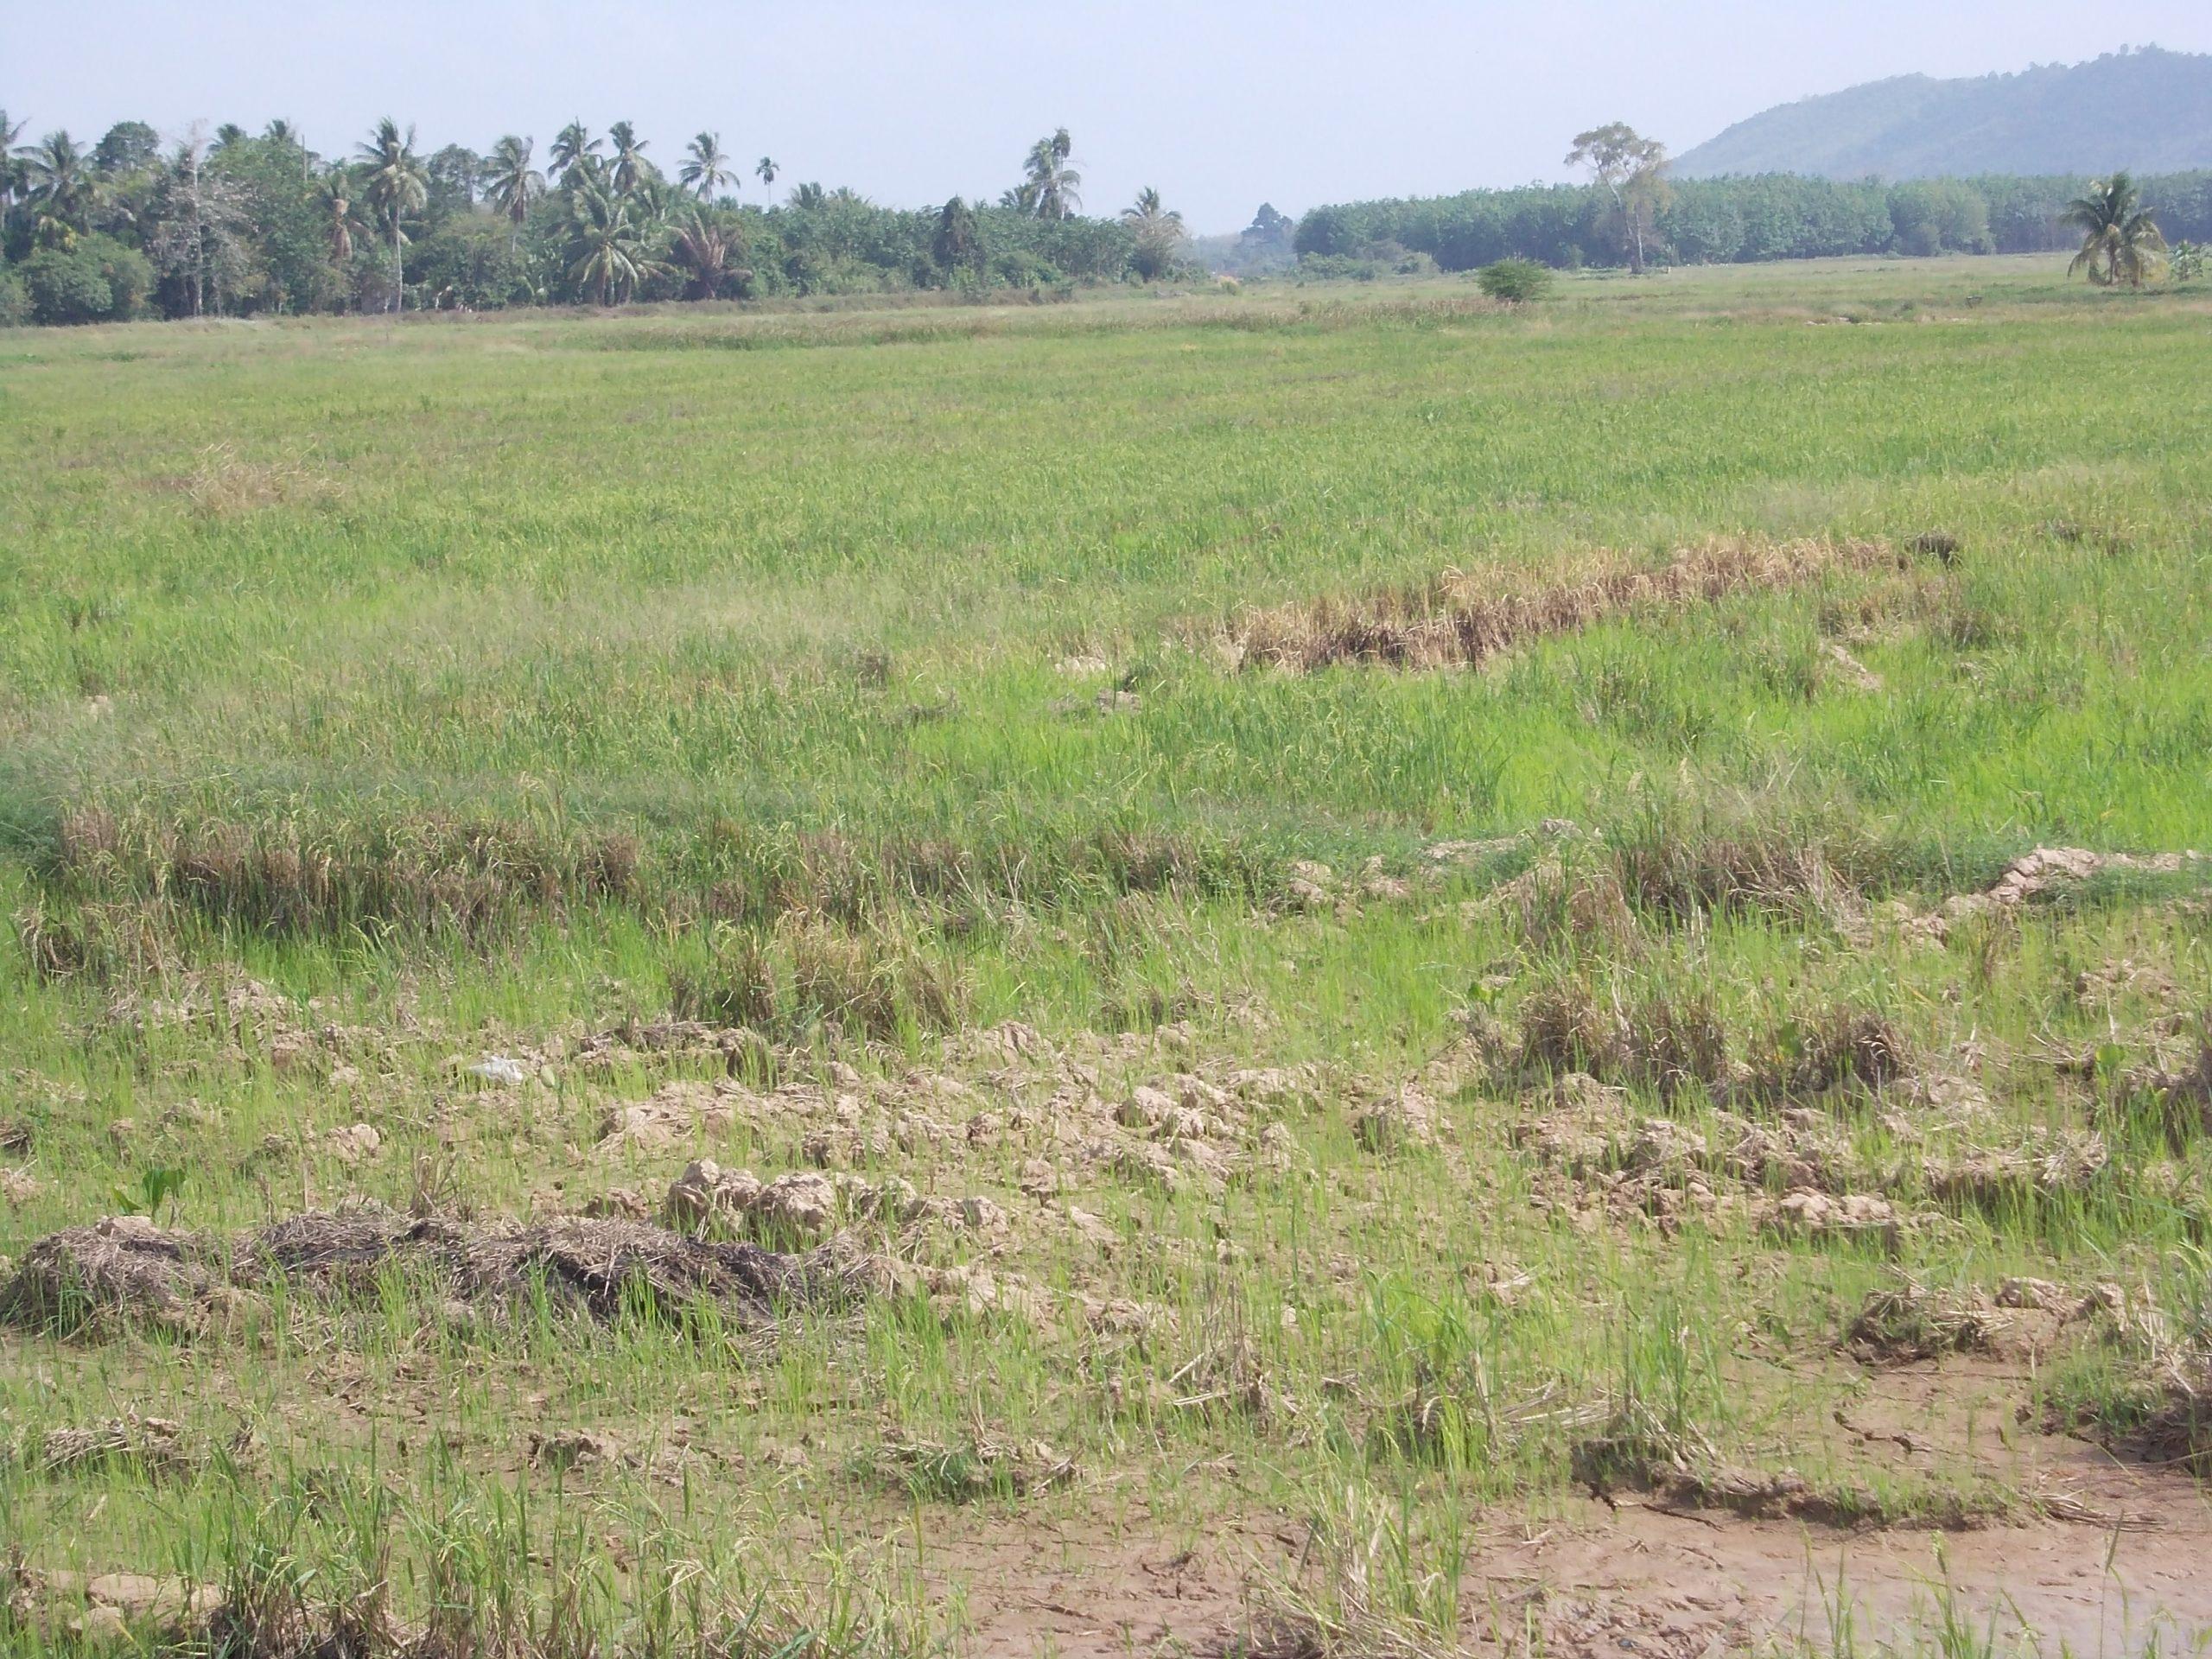 Kawasan sawah berdekatan Bukit Perangin mungkin terjejas jika kegiatan pembalakan tidak dihentikan | SAM